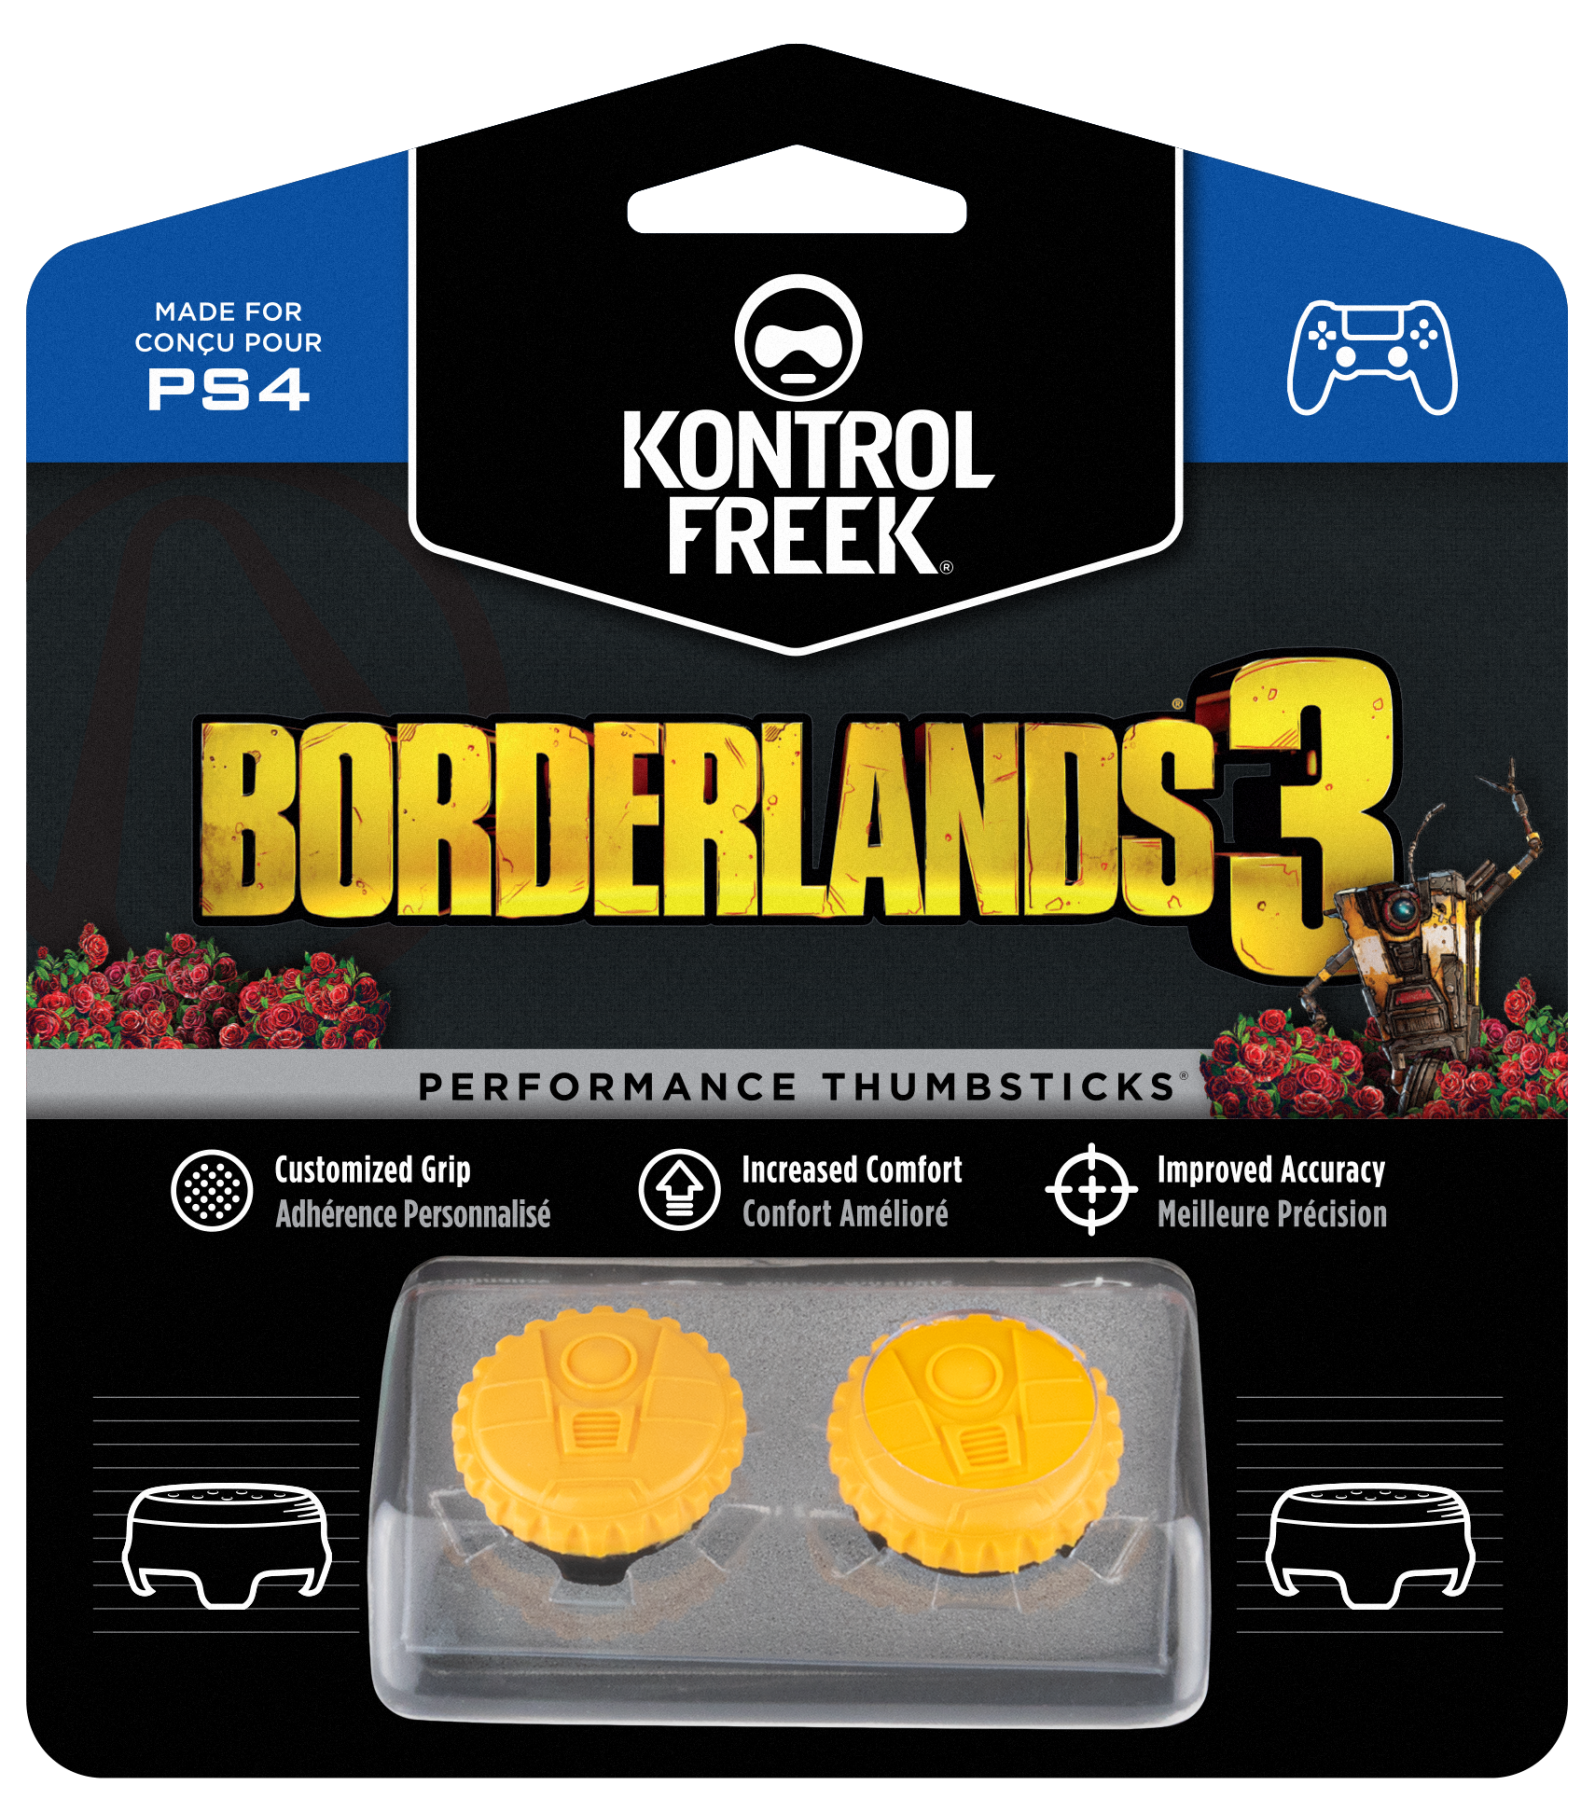 Borderlands 3 Claptrap KontrolFreek | Performance Thumbsticks | Накладки на стіки PS4/PS5